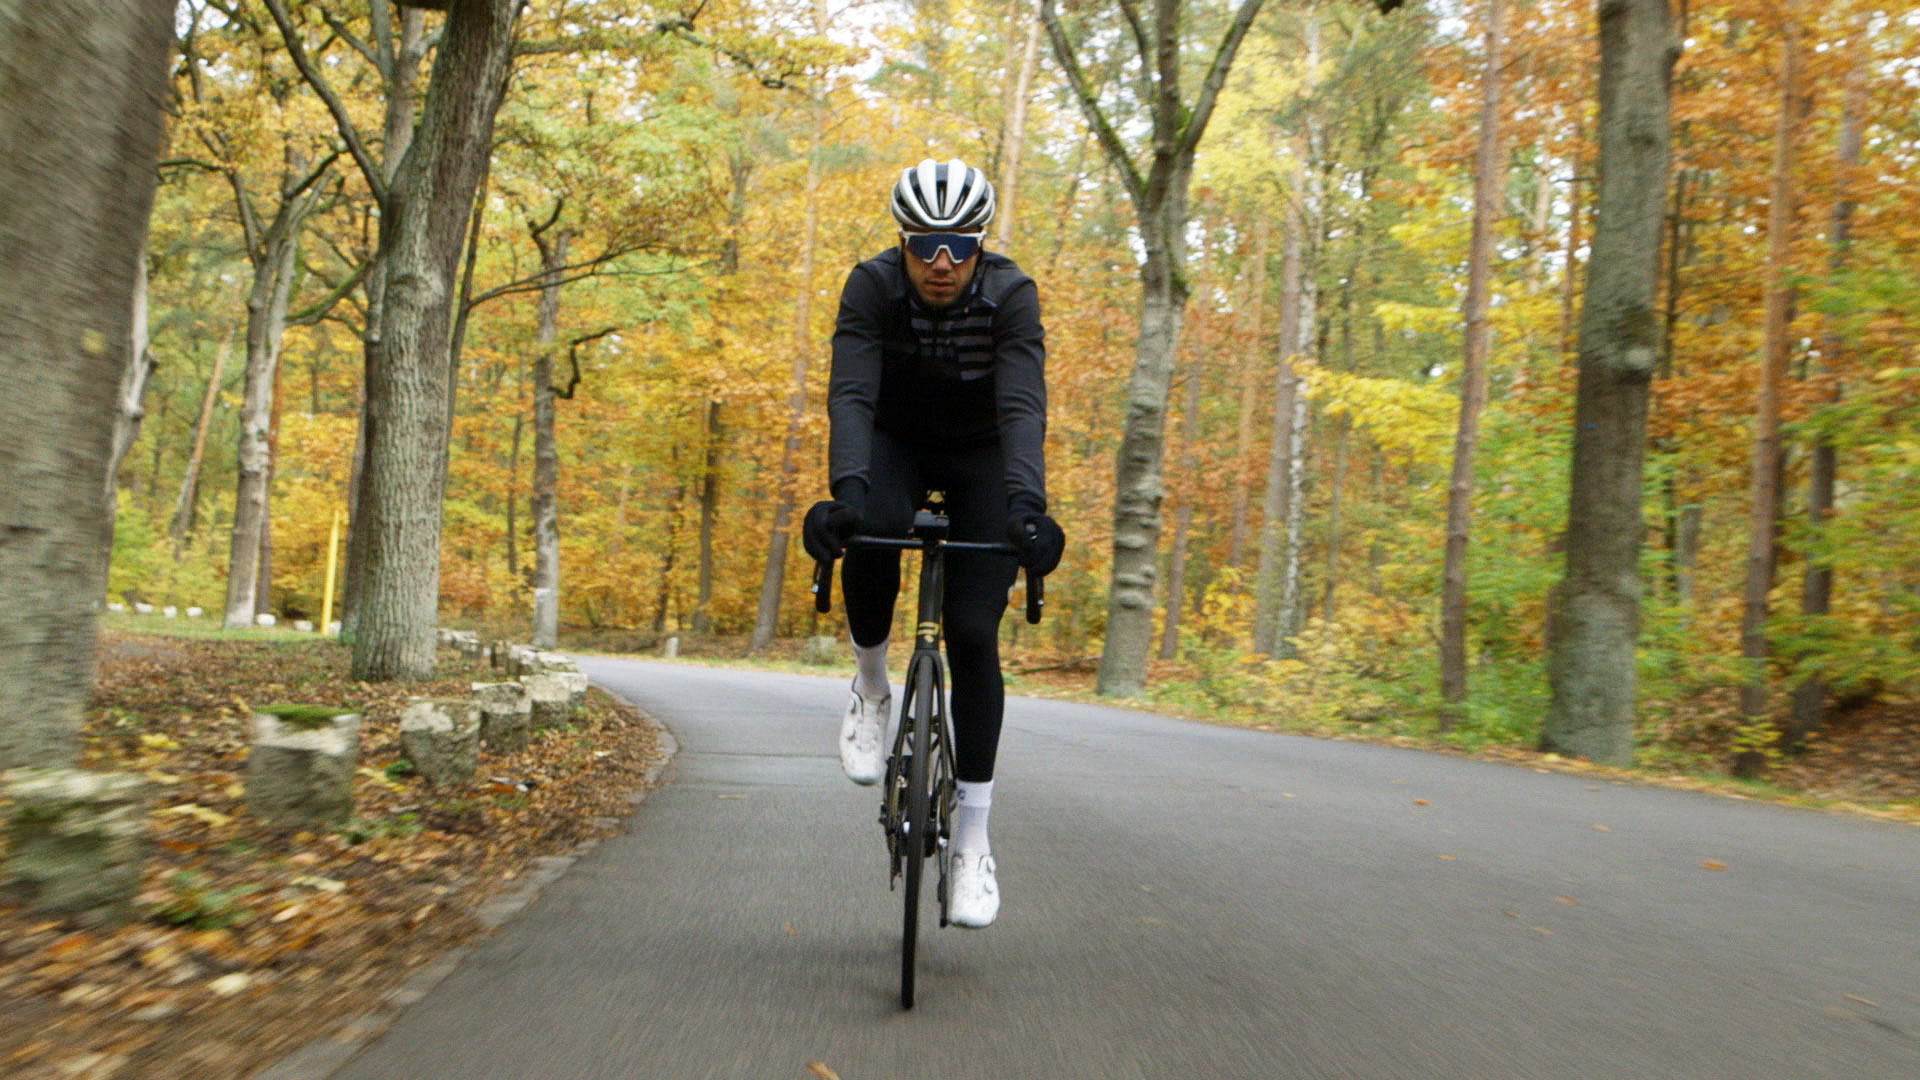 1-nazir-faehrt-fahrrad